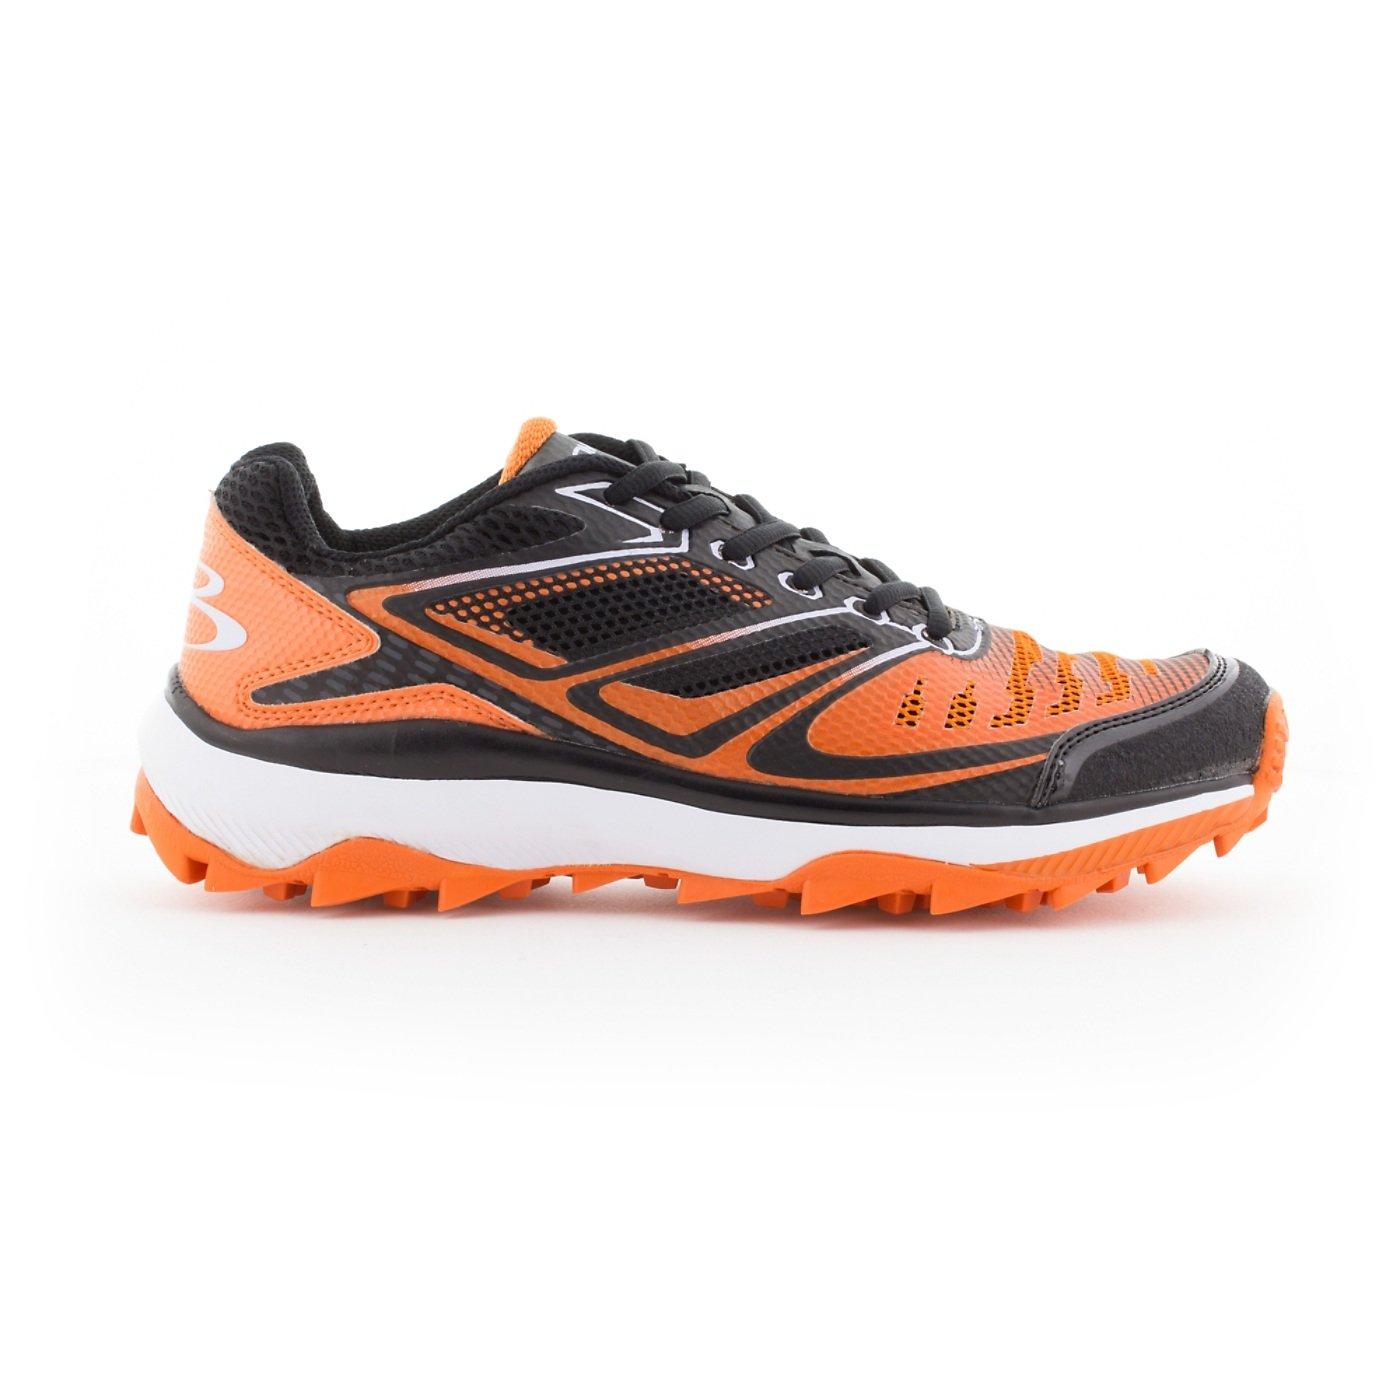 BoombahメンズTurbine Turf Shoes – 20カラーオプション – 複数のサイズ B076JRC7BP 5.5 ブラック/オレンジ ブラック/オレンジ 5.5